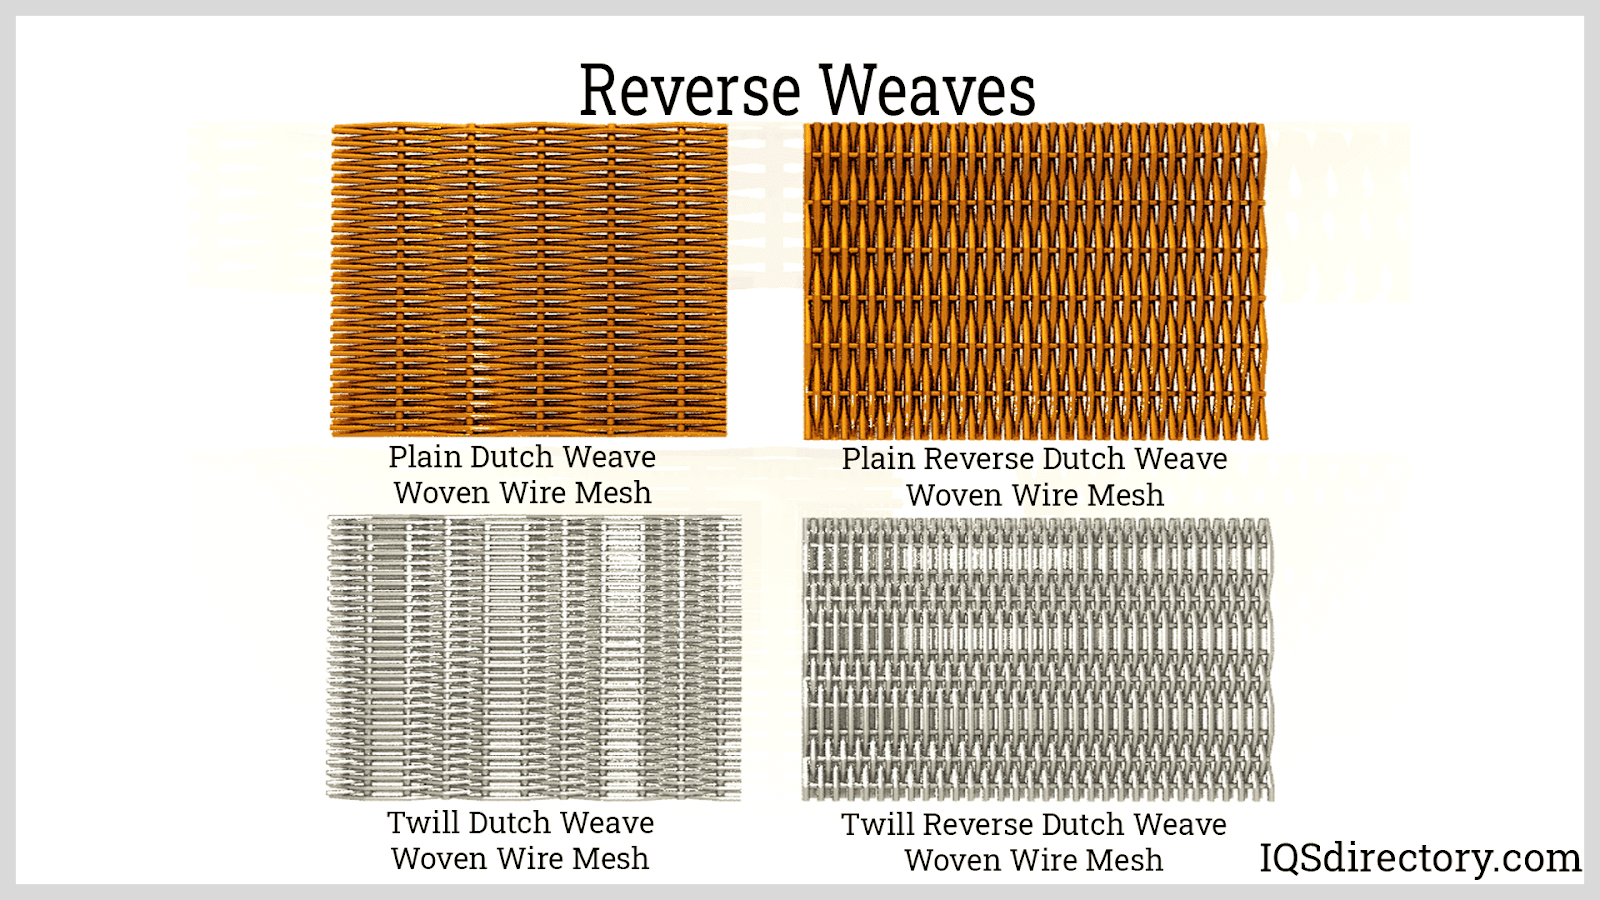 Reverse Weaves